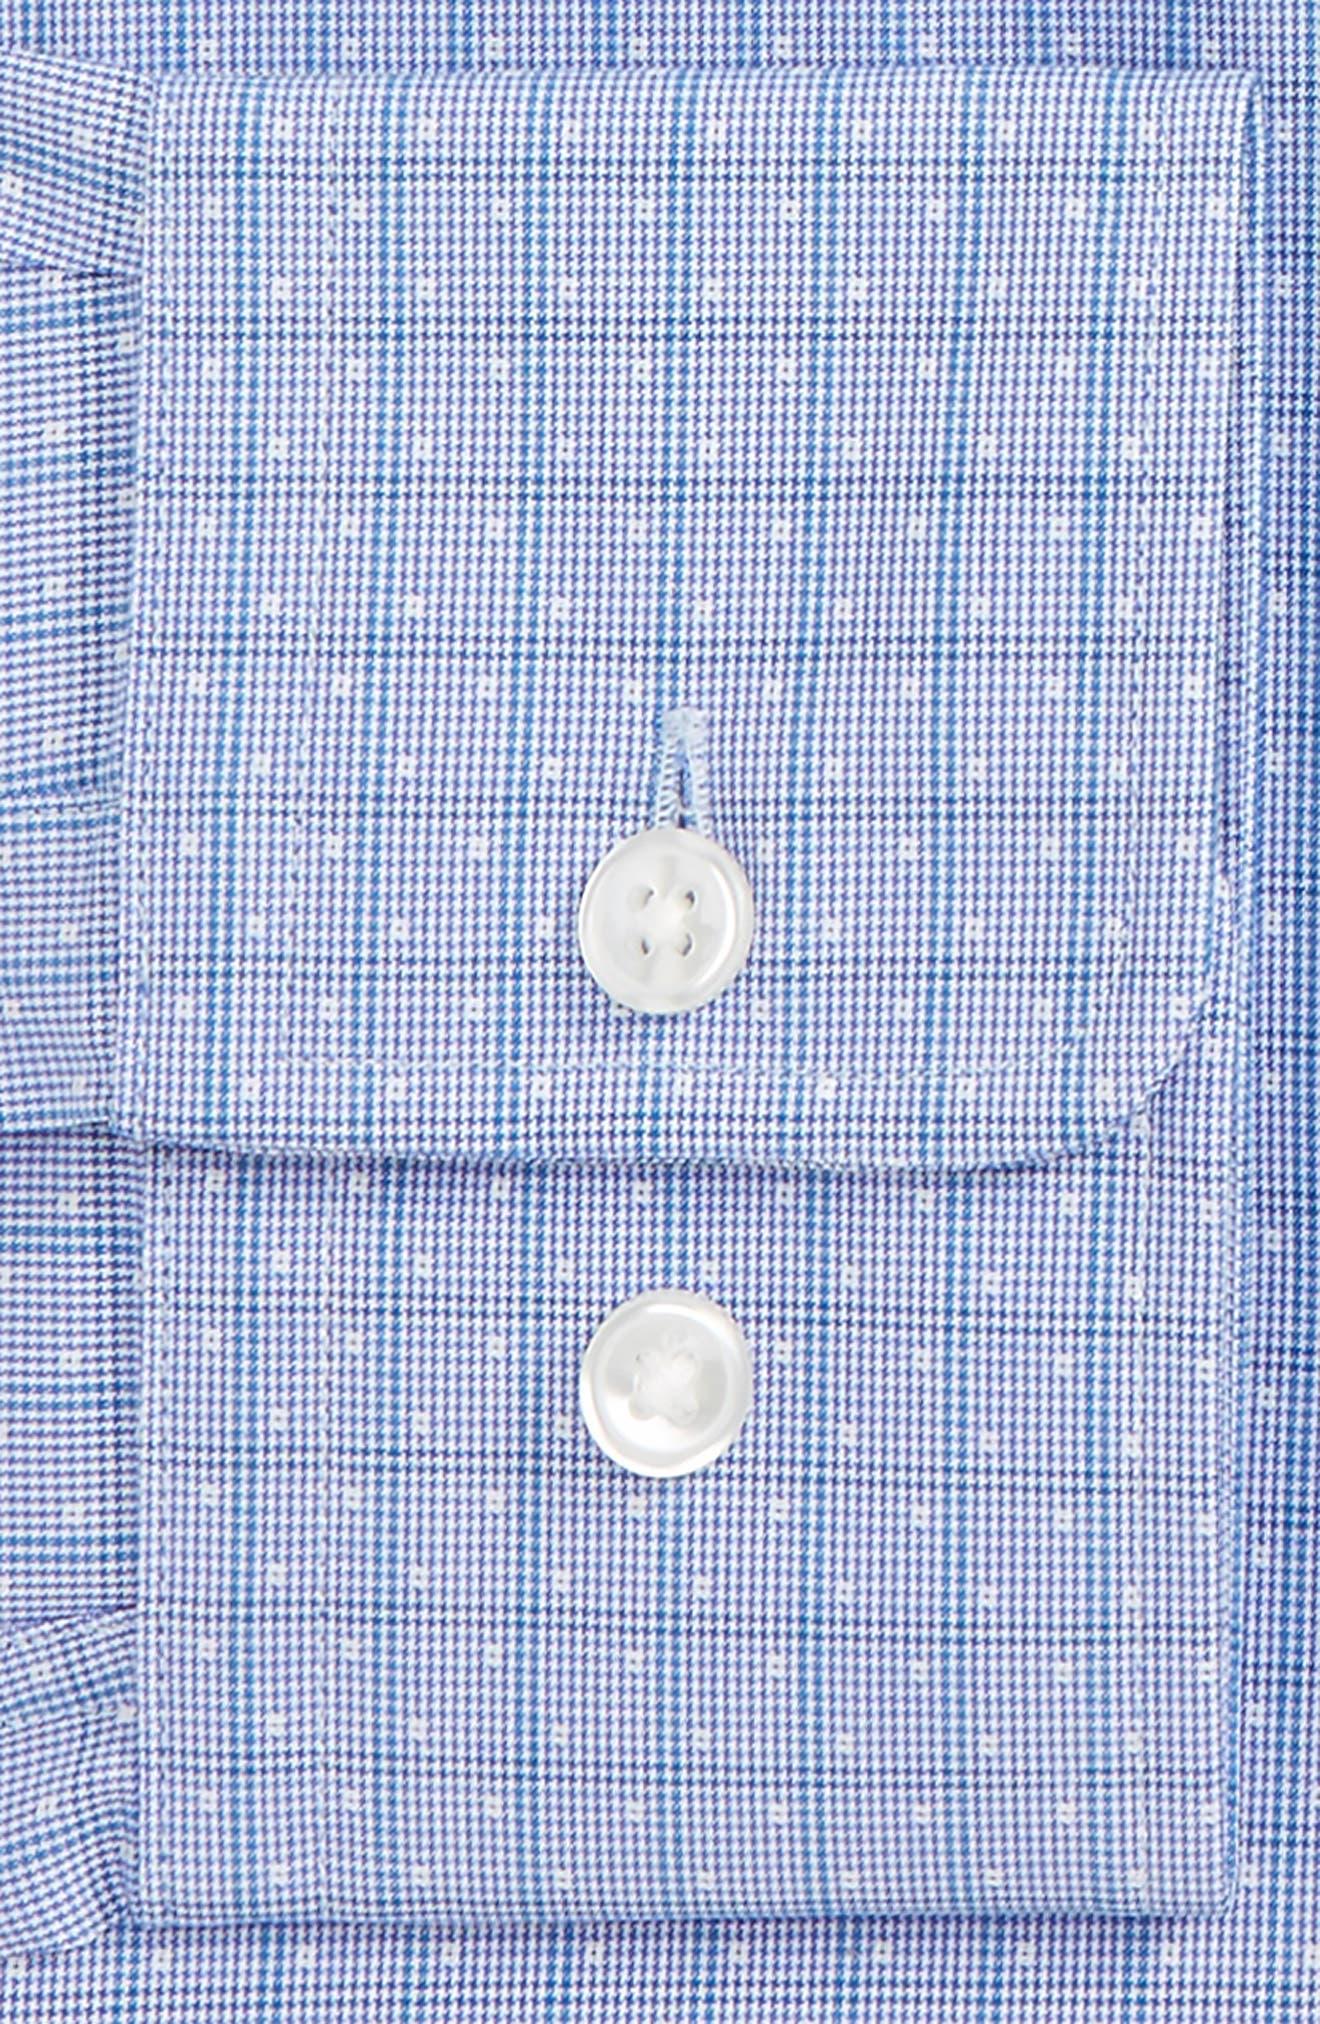 Marley Sharp Fit Check Dress Shirt,                             Alternate thumbnail 2, color,                             Blue